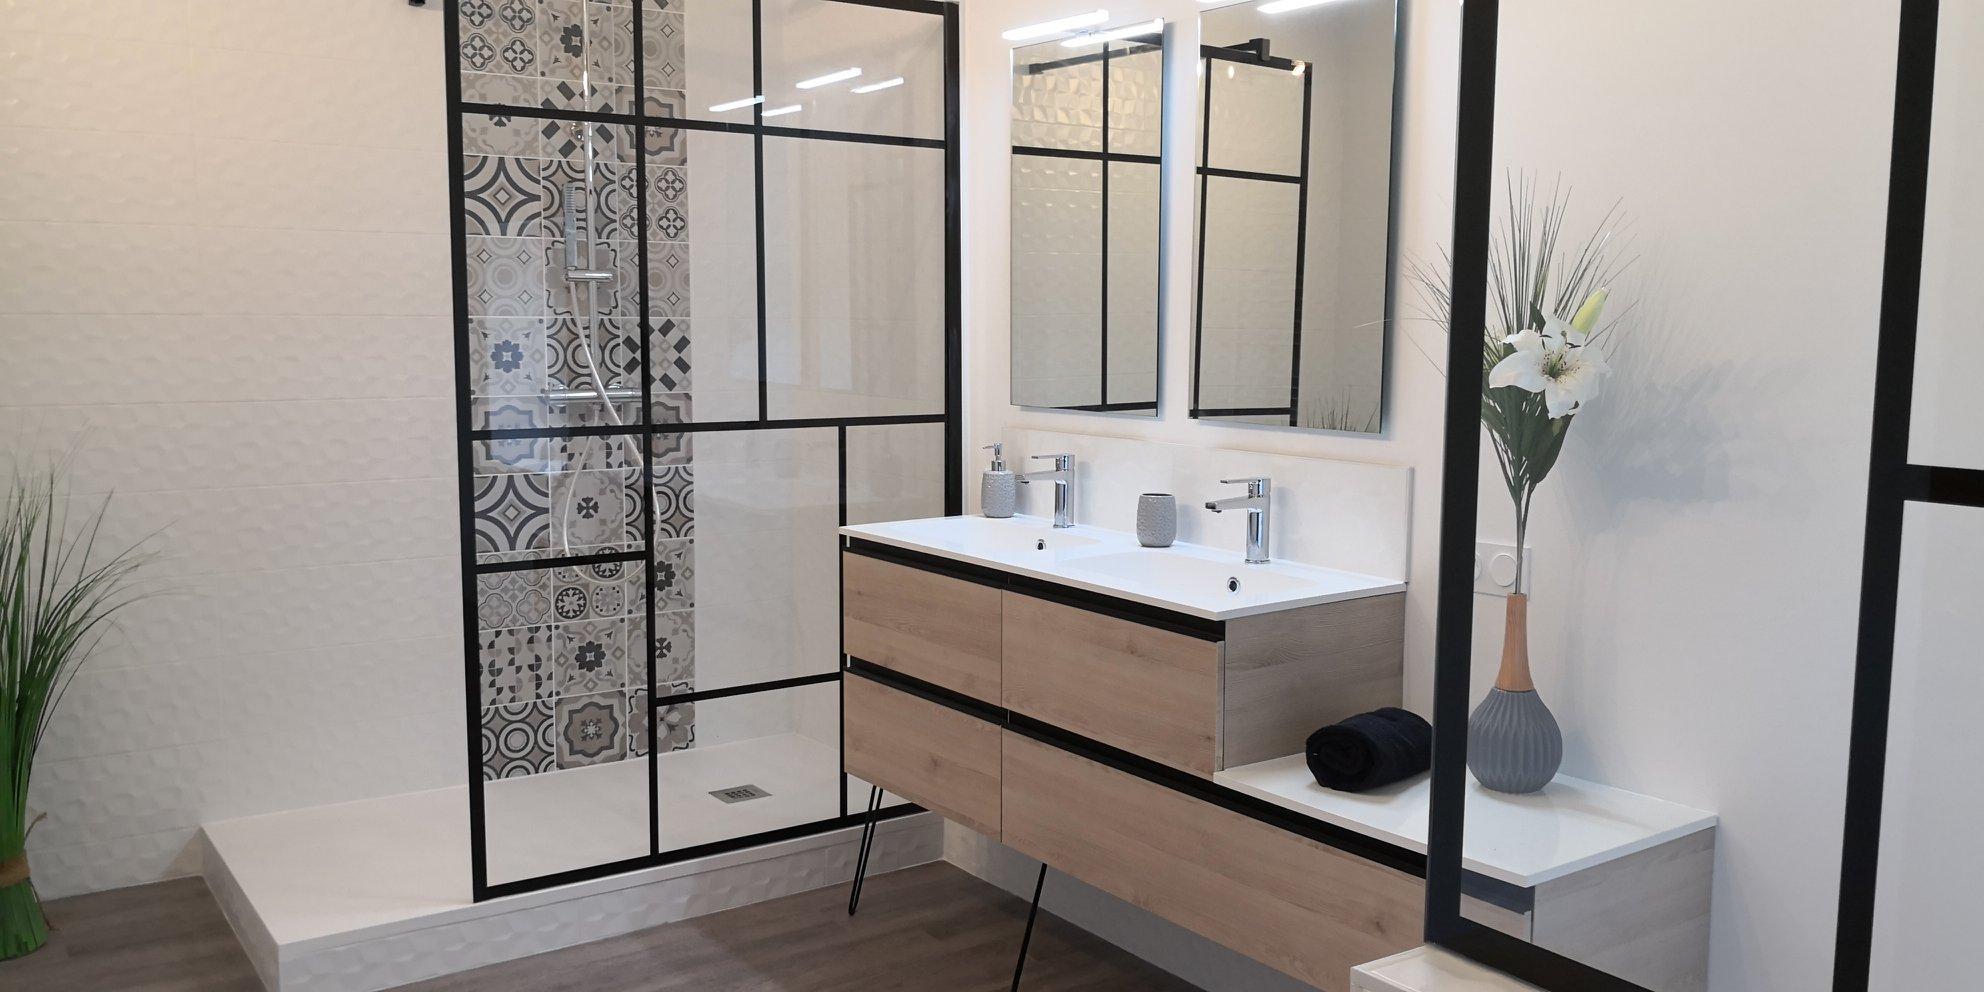 salle de bain industriel loft